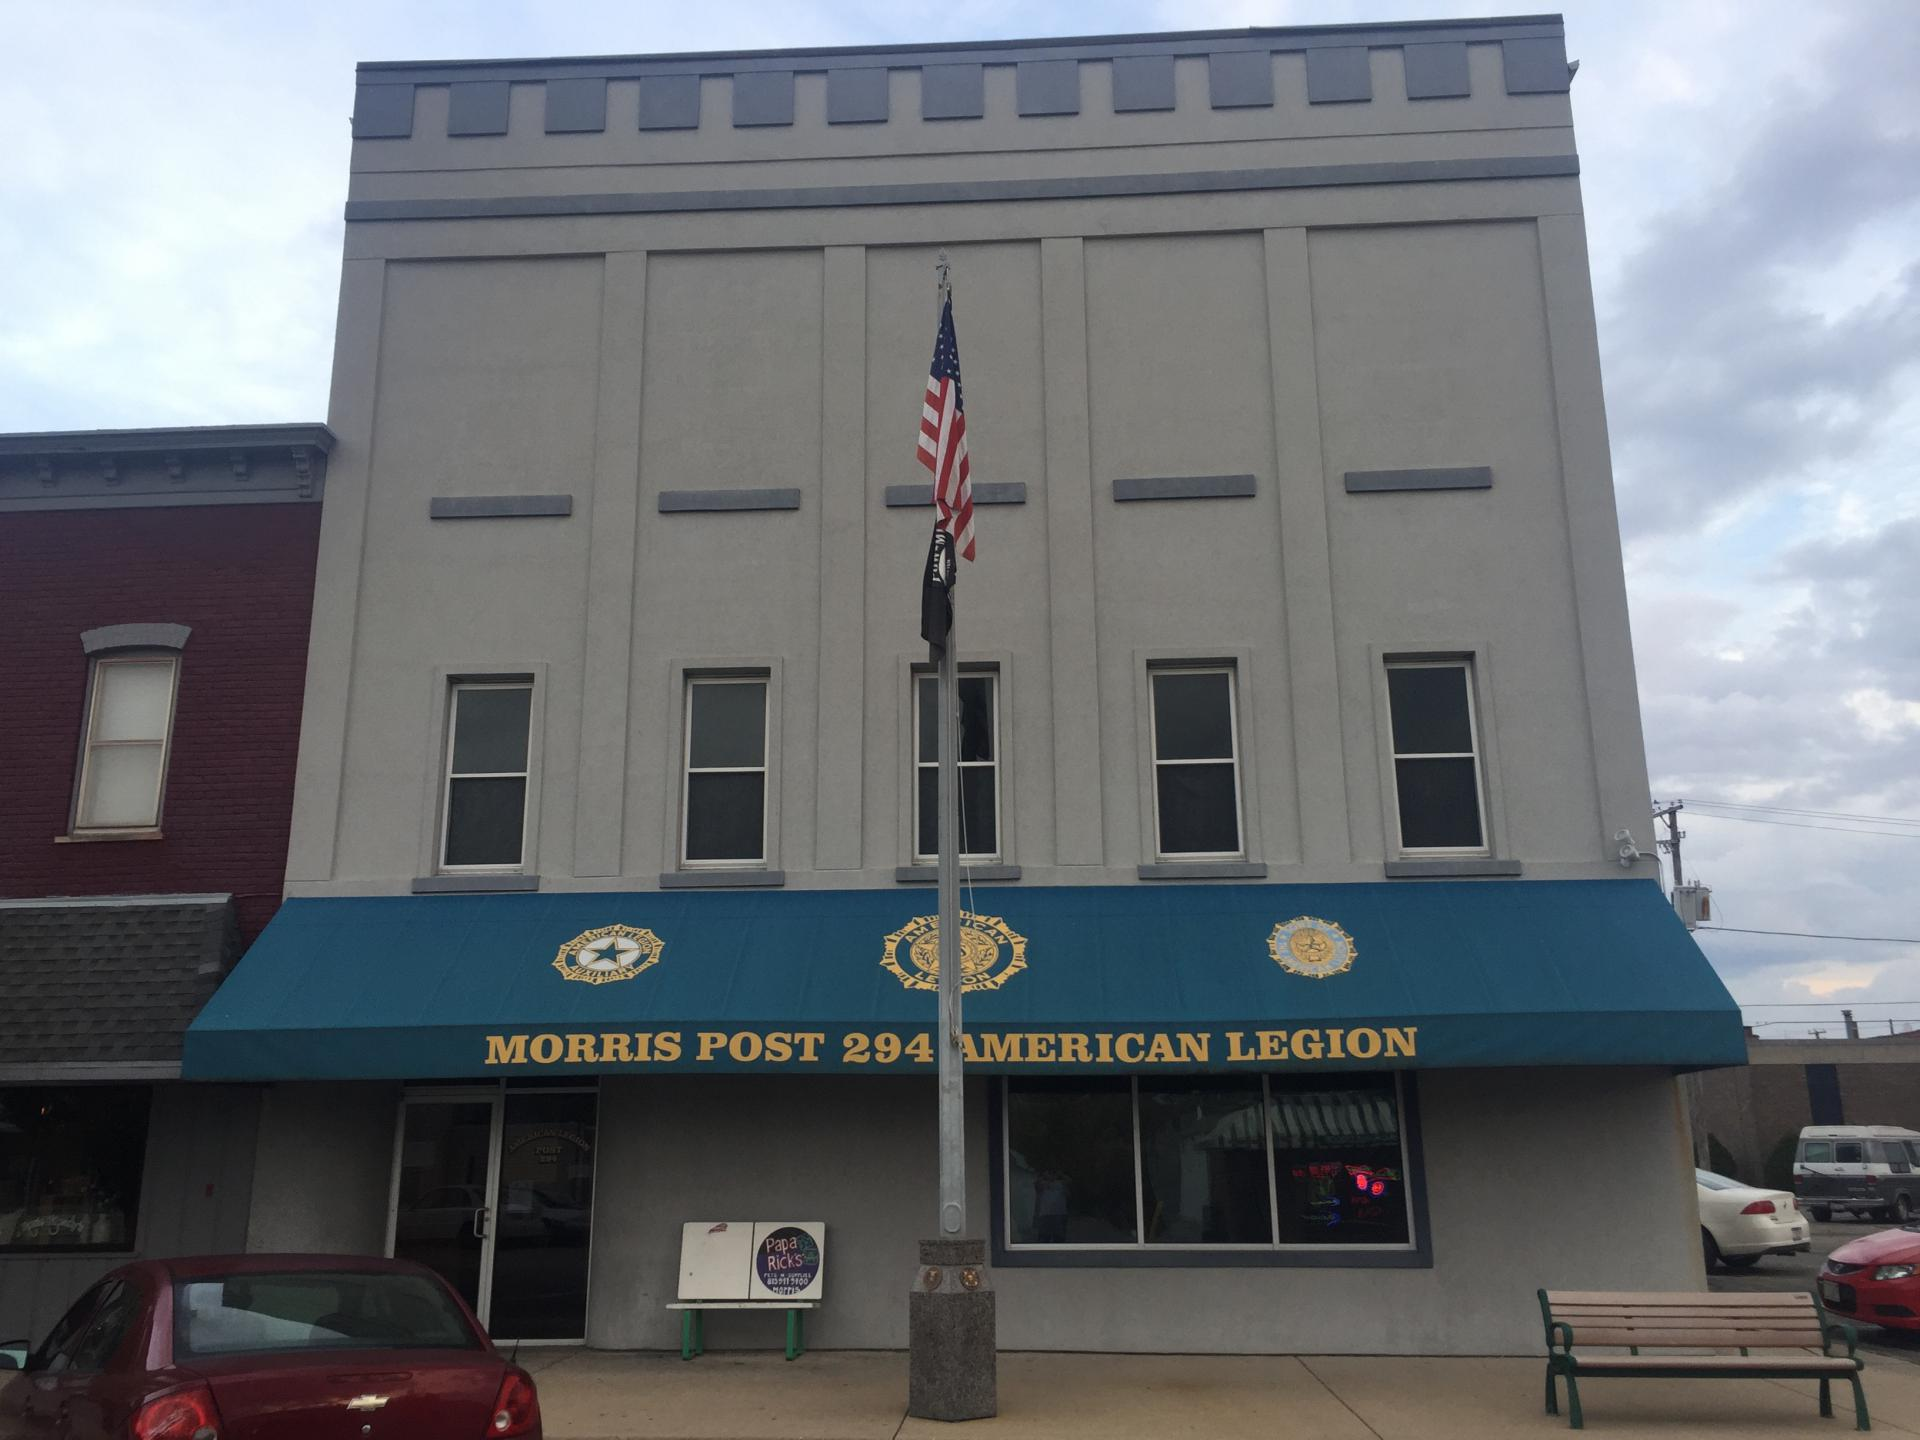 Post 294 Morris, Illinois